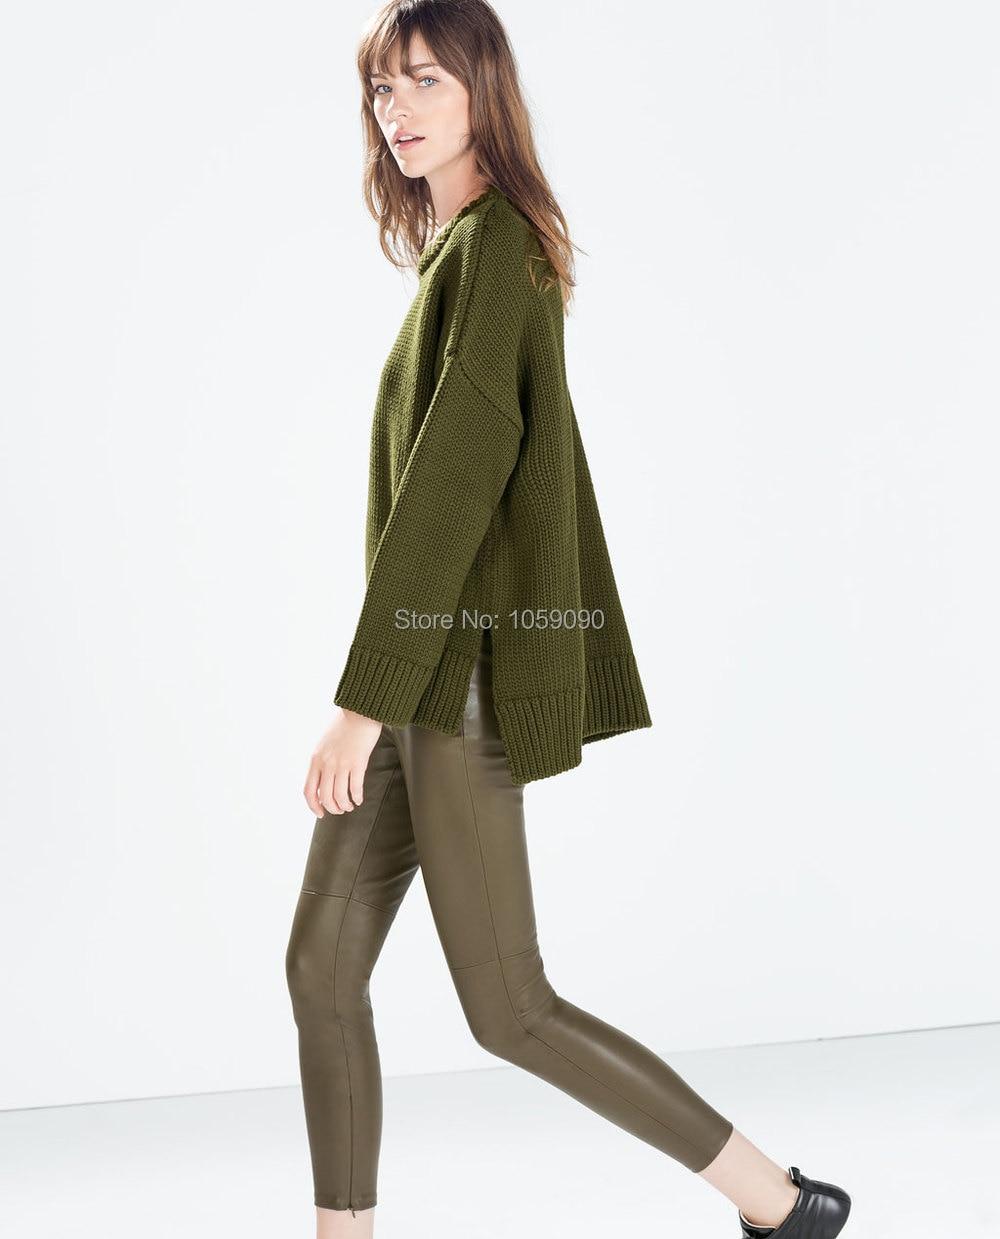 Womens Fashion Brand Beige Army Green Khaki Black Mid Elastic waist zipper pu leather Pencil   pants   Thin stretch Trousers   Capris